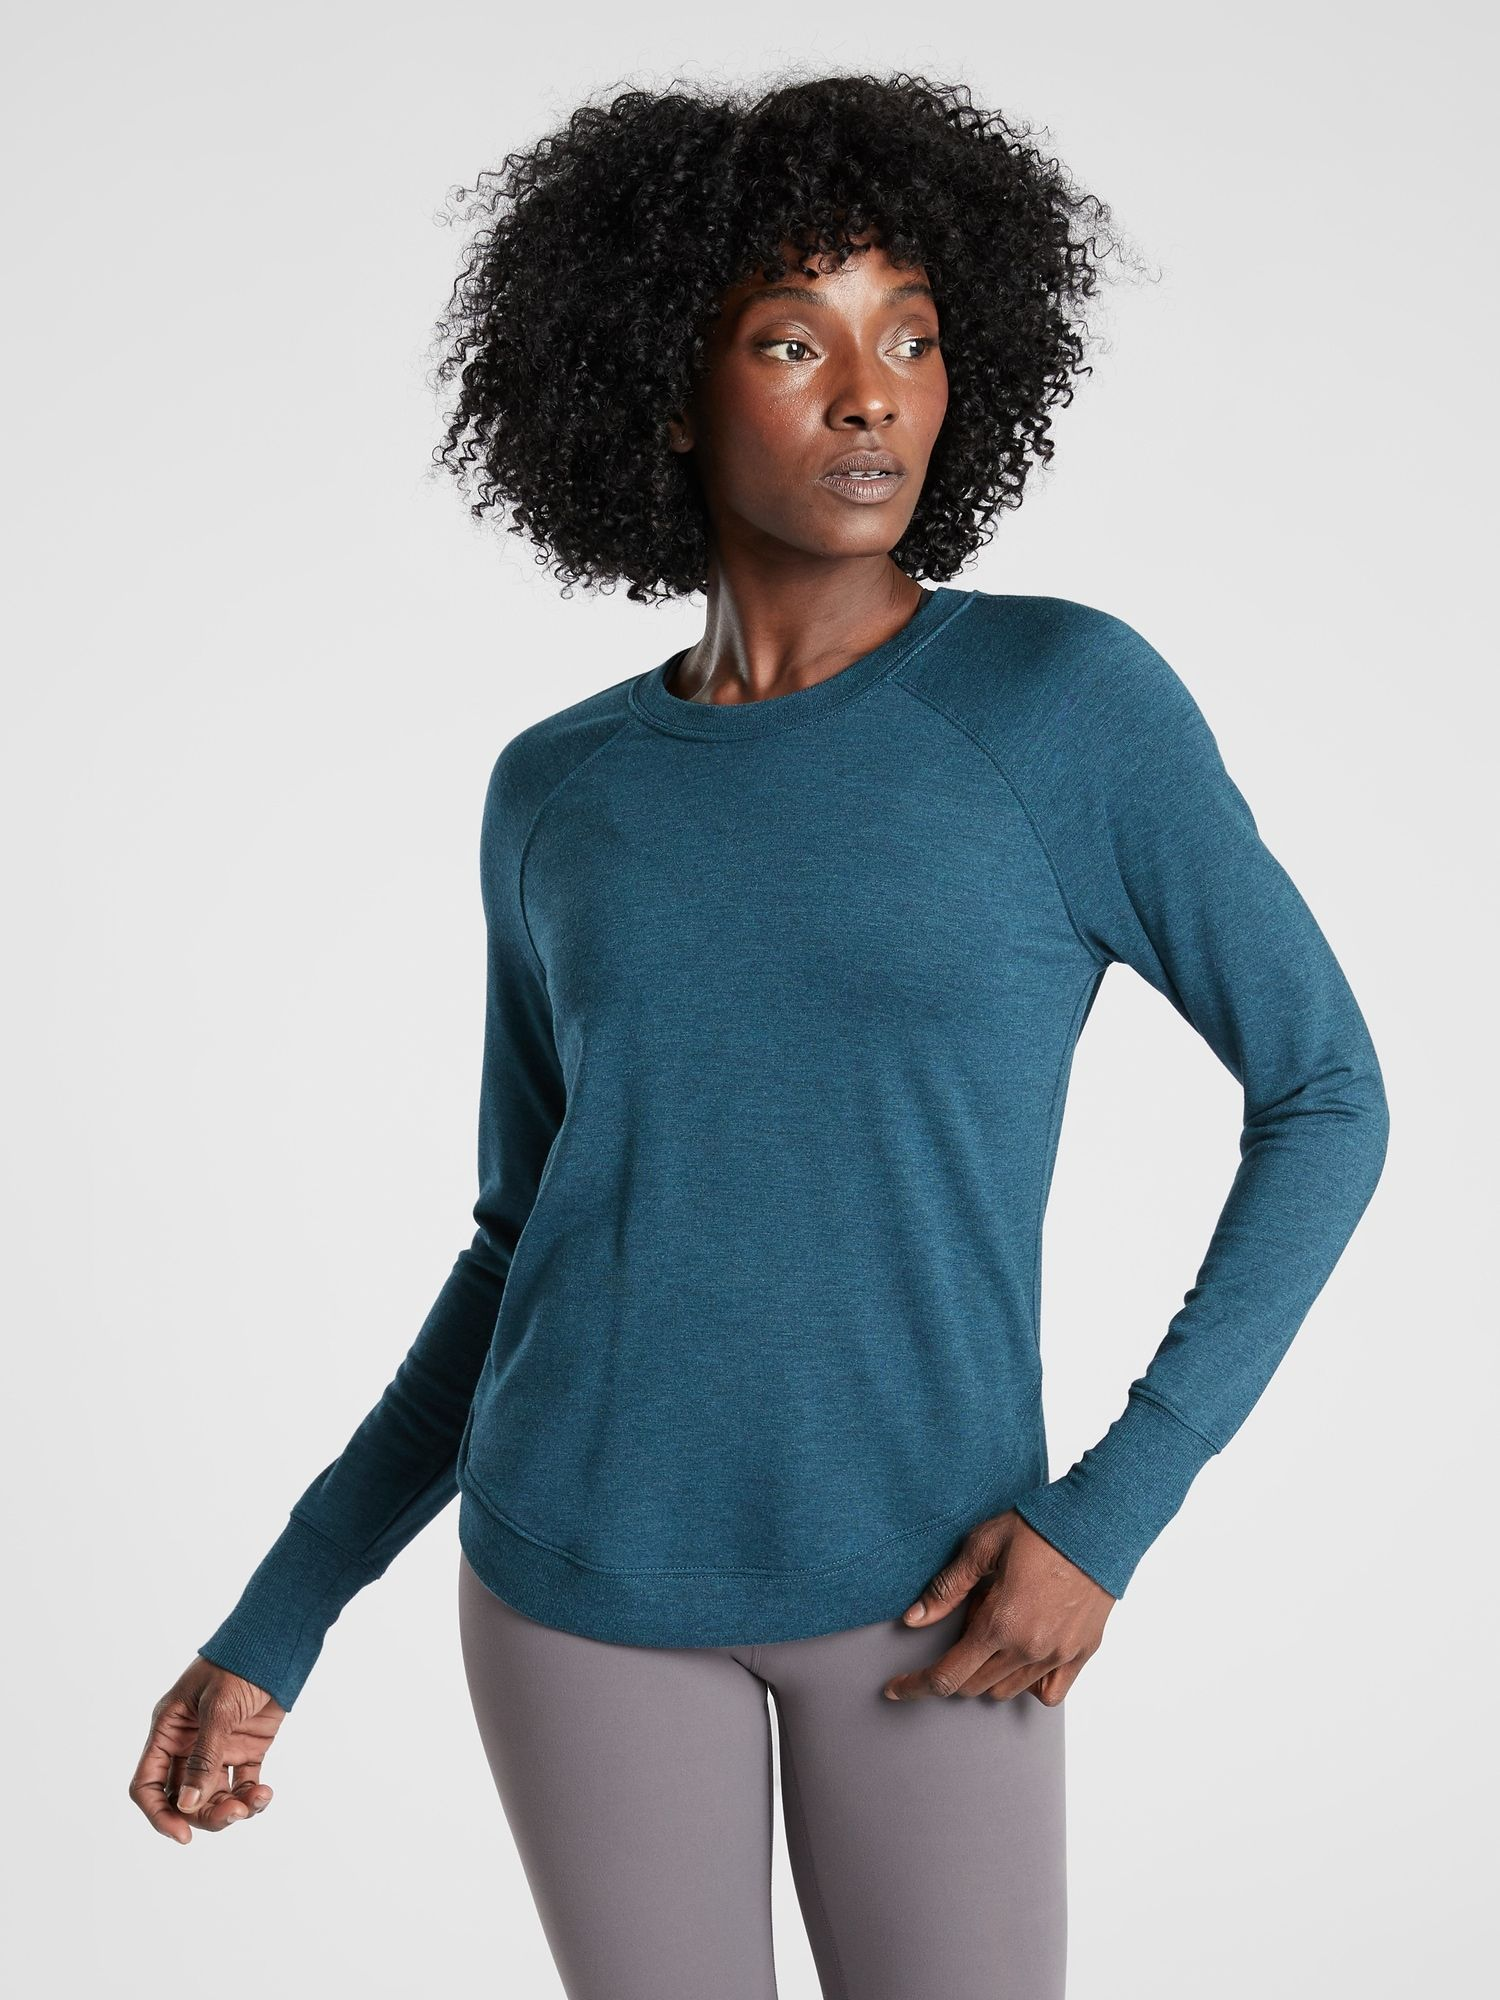 Mindset Sweatshirt Athleta Workout Tops For Women Clothes For Women Athletic Tops Women [ 2000 x 1500 Pixel ]